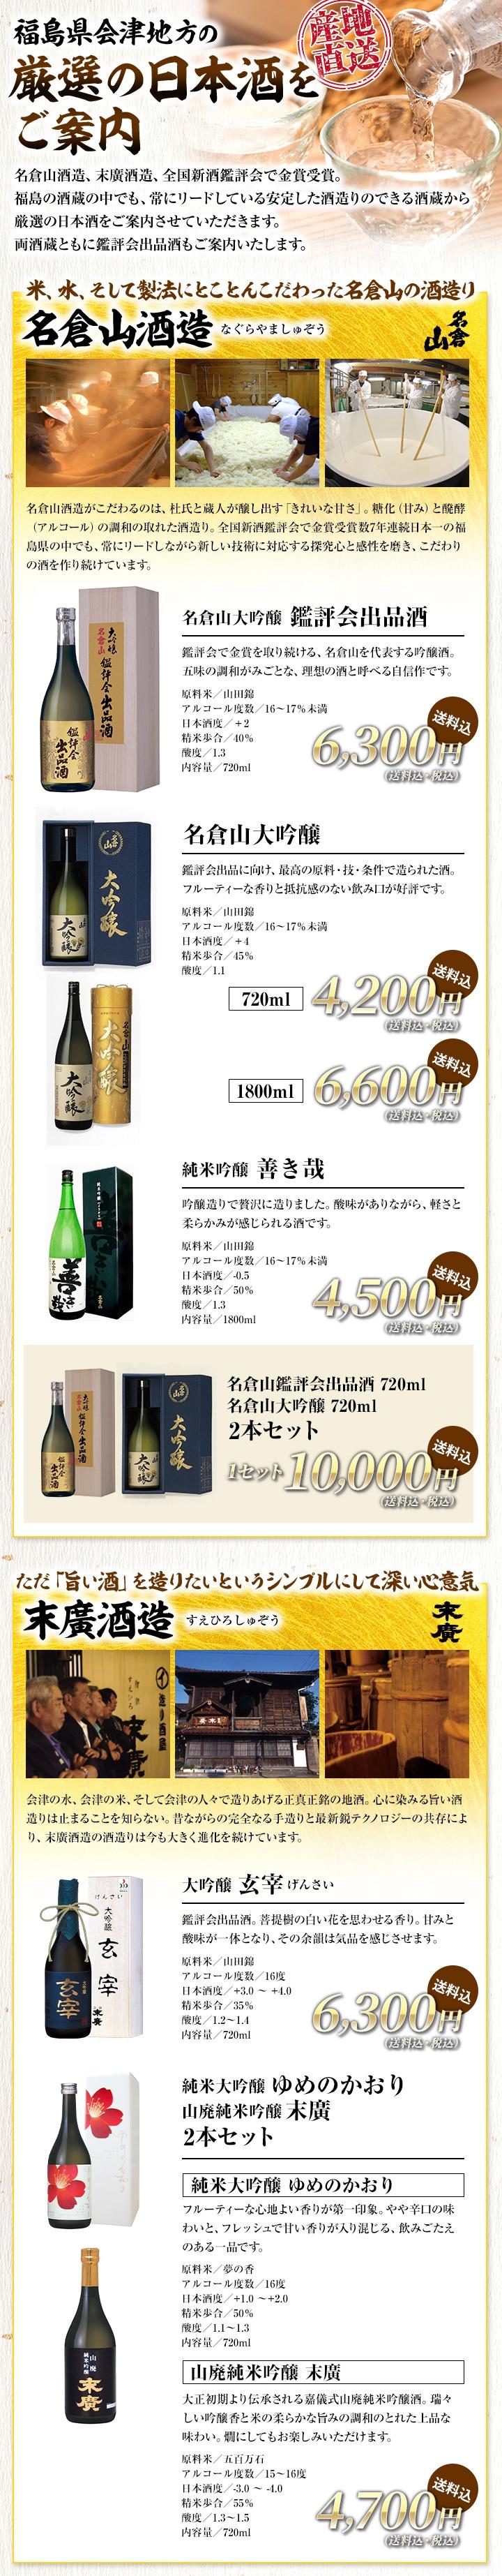 【福島 会津地方】厳選酒蔵の日本酒をご案内 ★送料込★